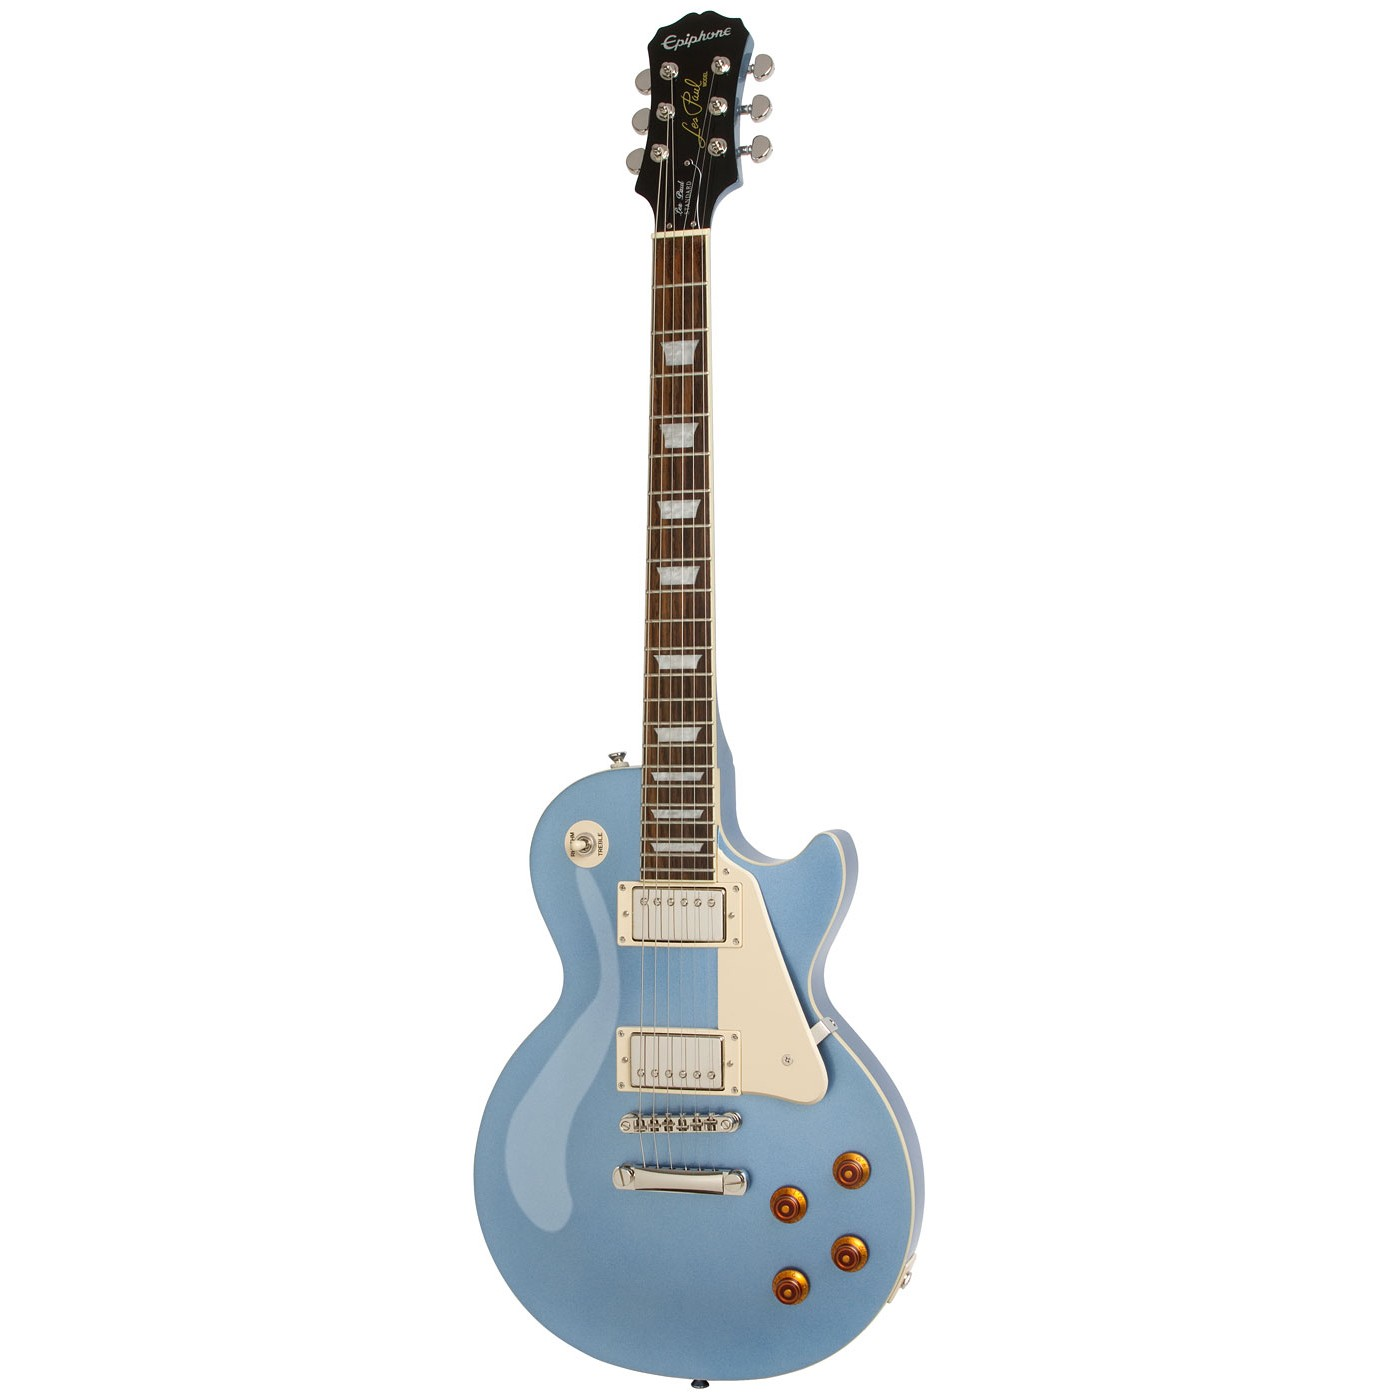 Epiphone Les Paul Standard Pelham Blue B-Ware (reparierter Halsriss und kleiner Lackschaden am Korpus)